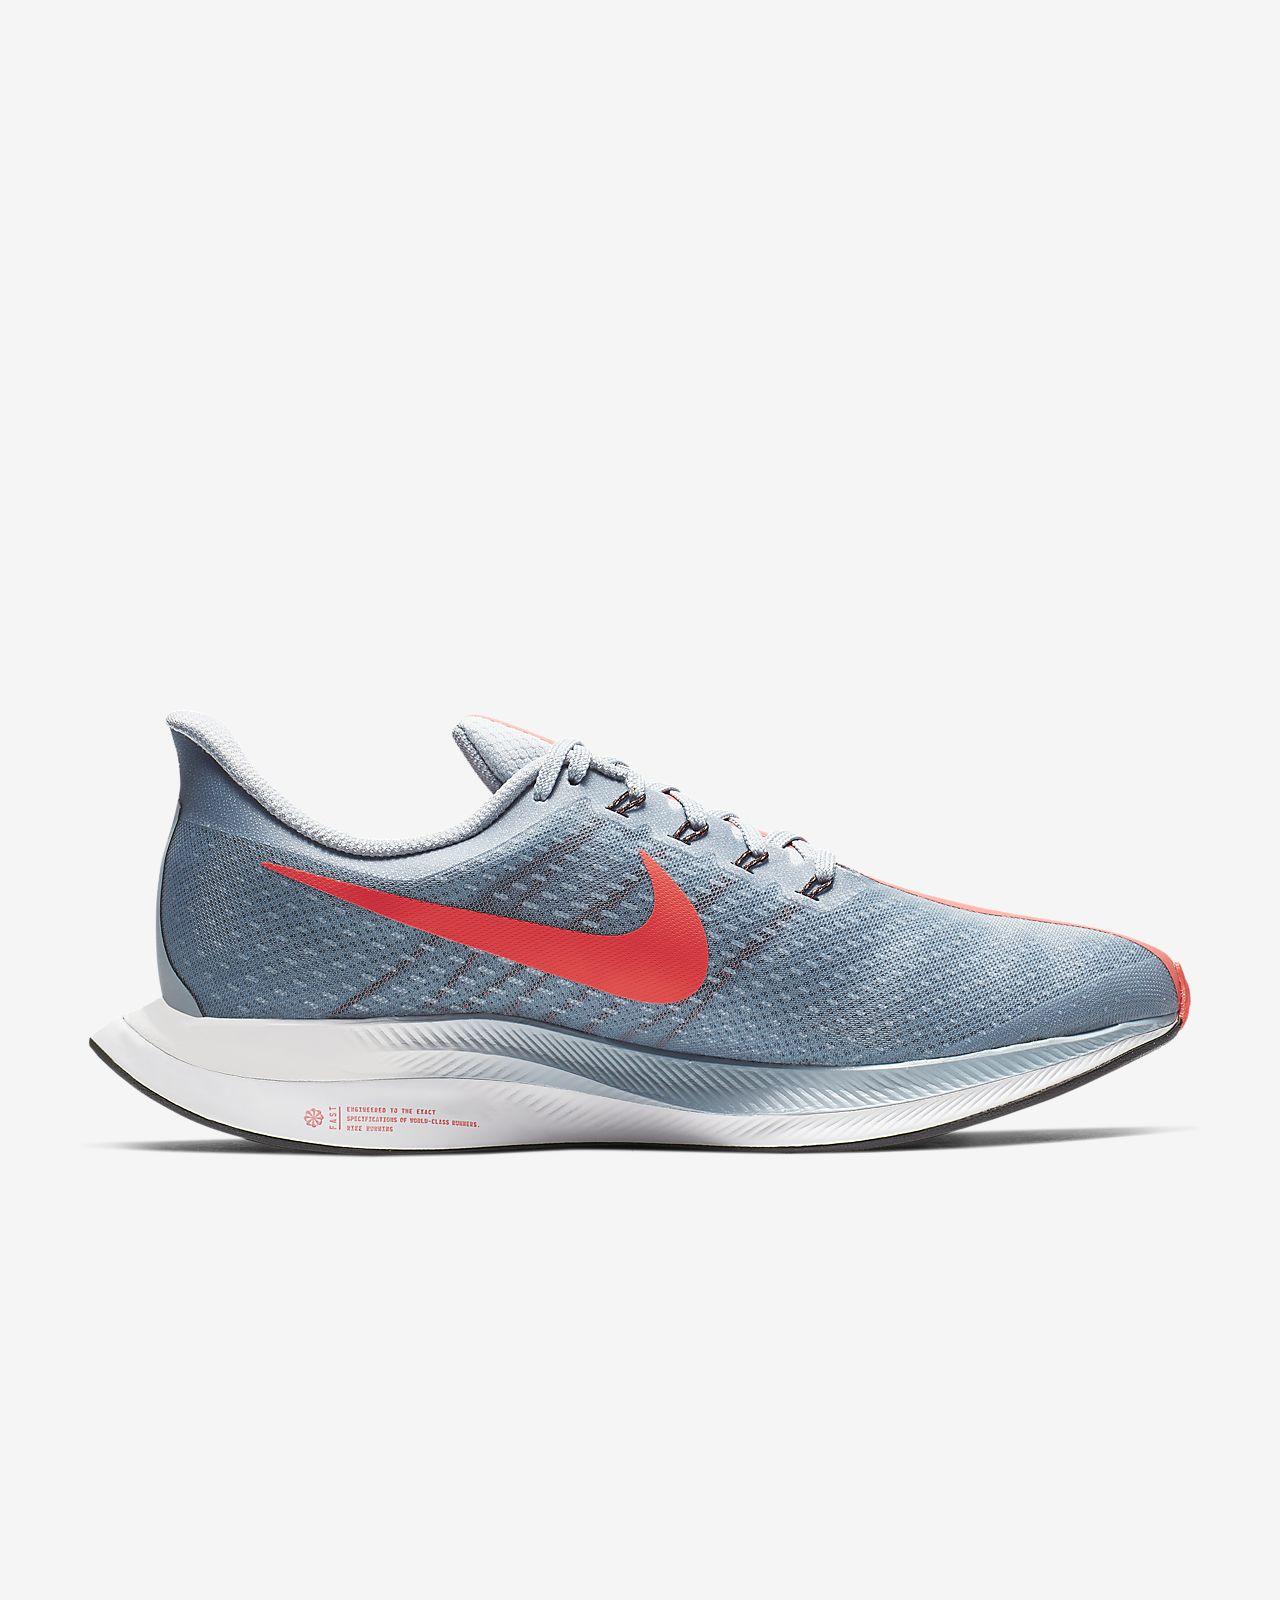 buy cheap 7ab58 0ed5e ... Chaussure de running Nike Zoom Pegasus Turbo pour Homme